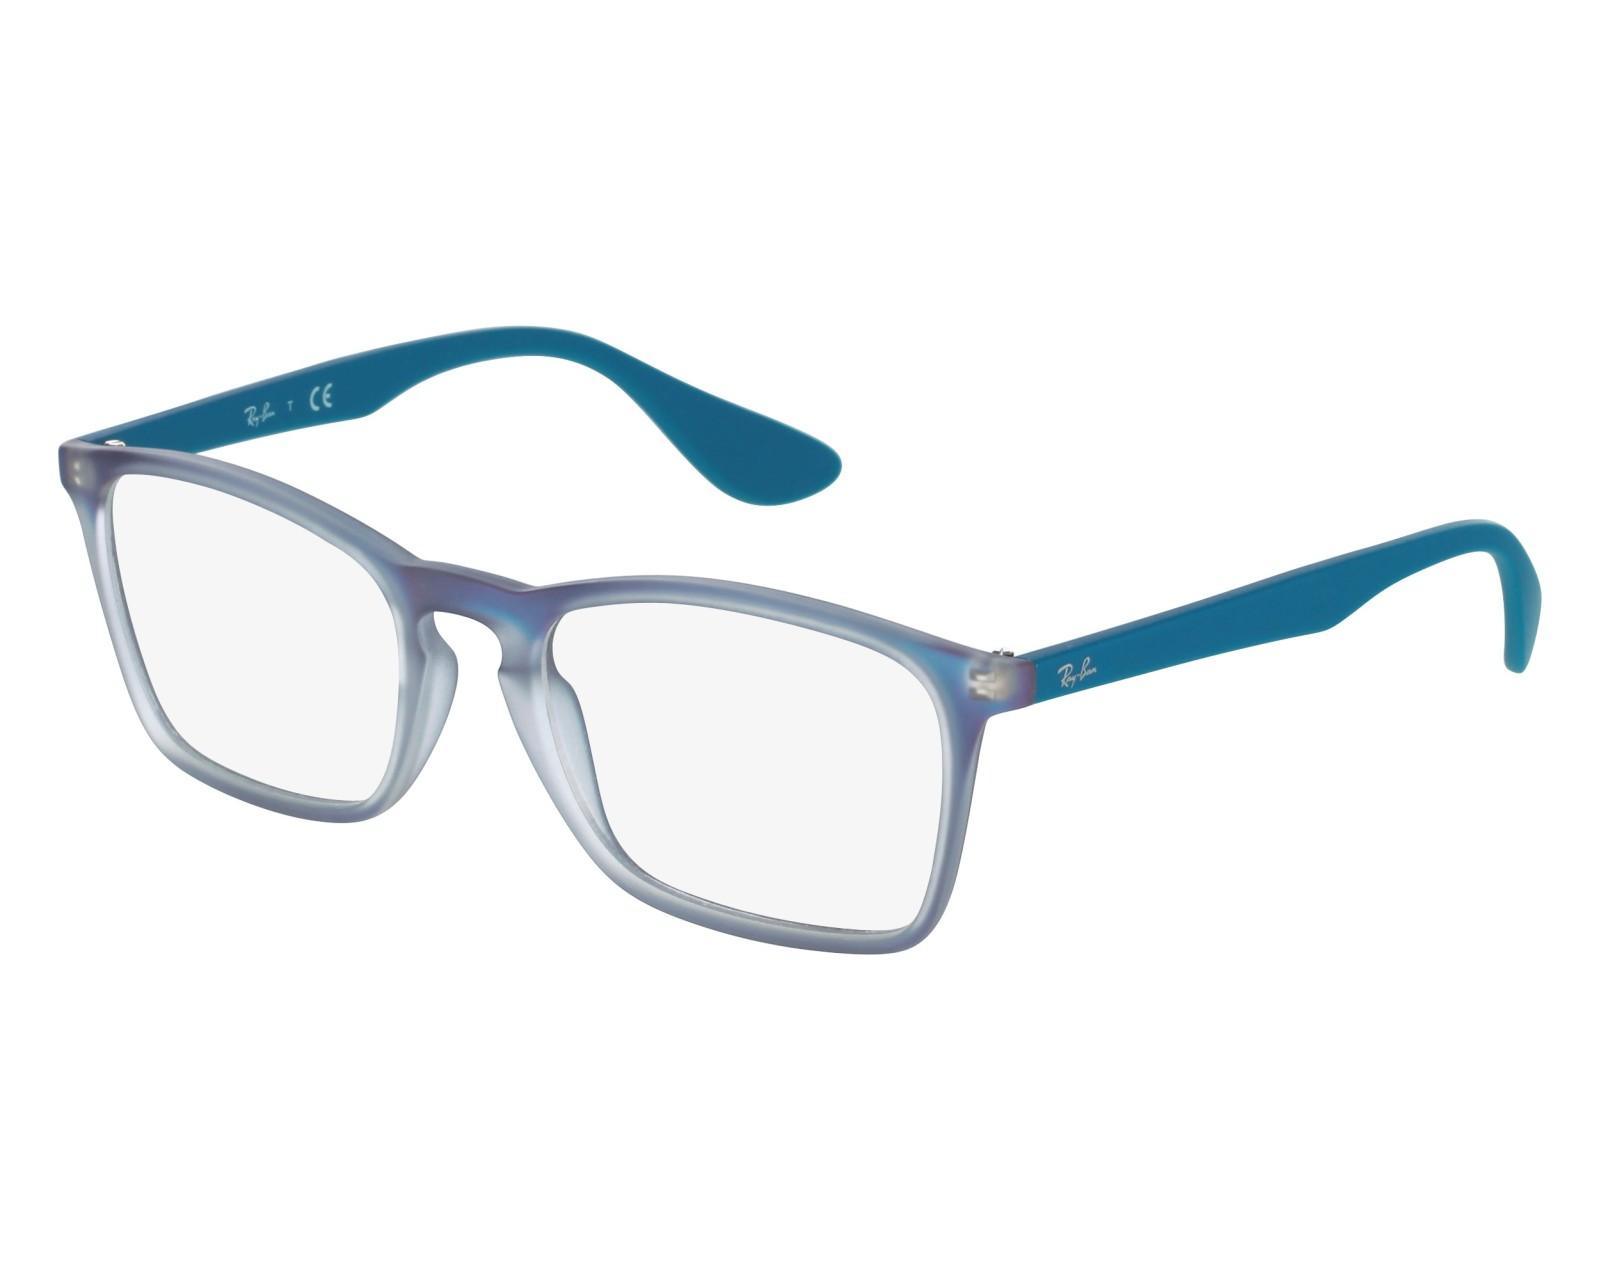 64474c474b2 eyeglasses Ray-Ban RX-7045 5484 55-18 Blue front view